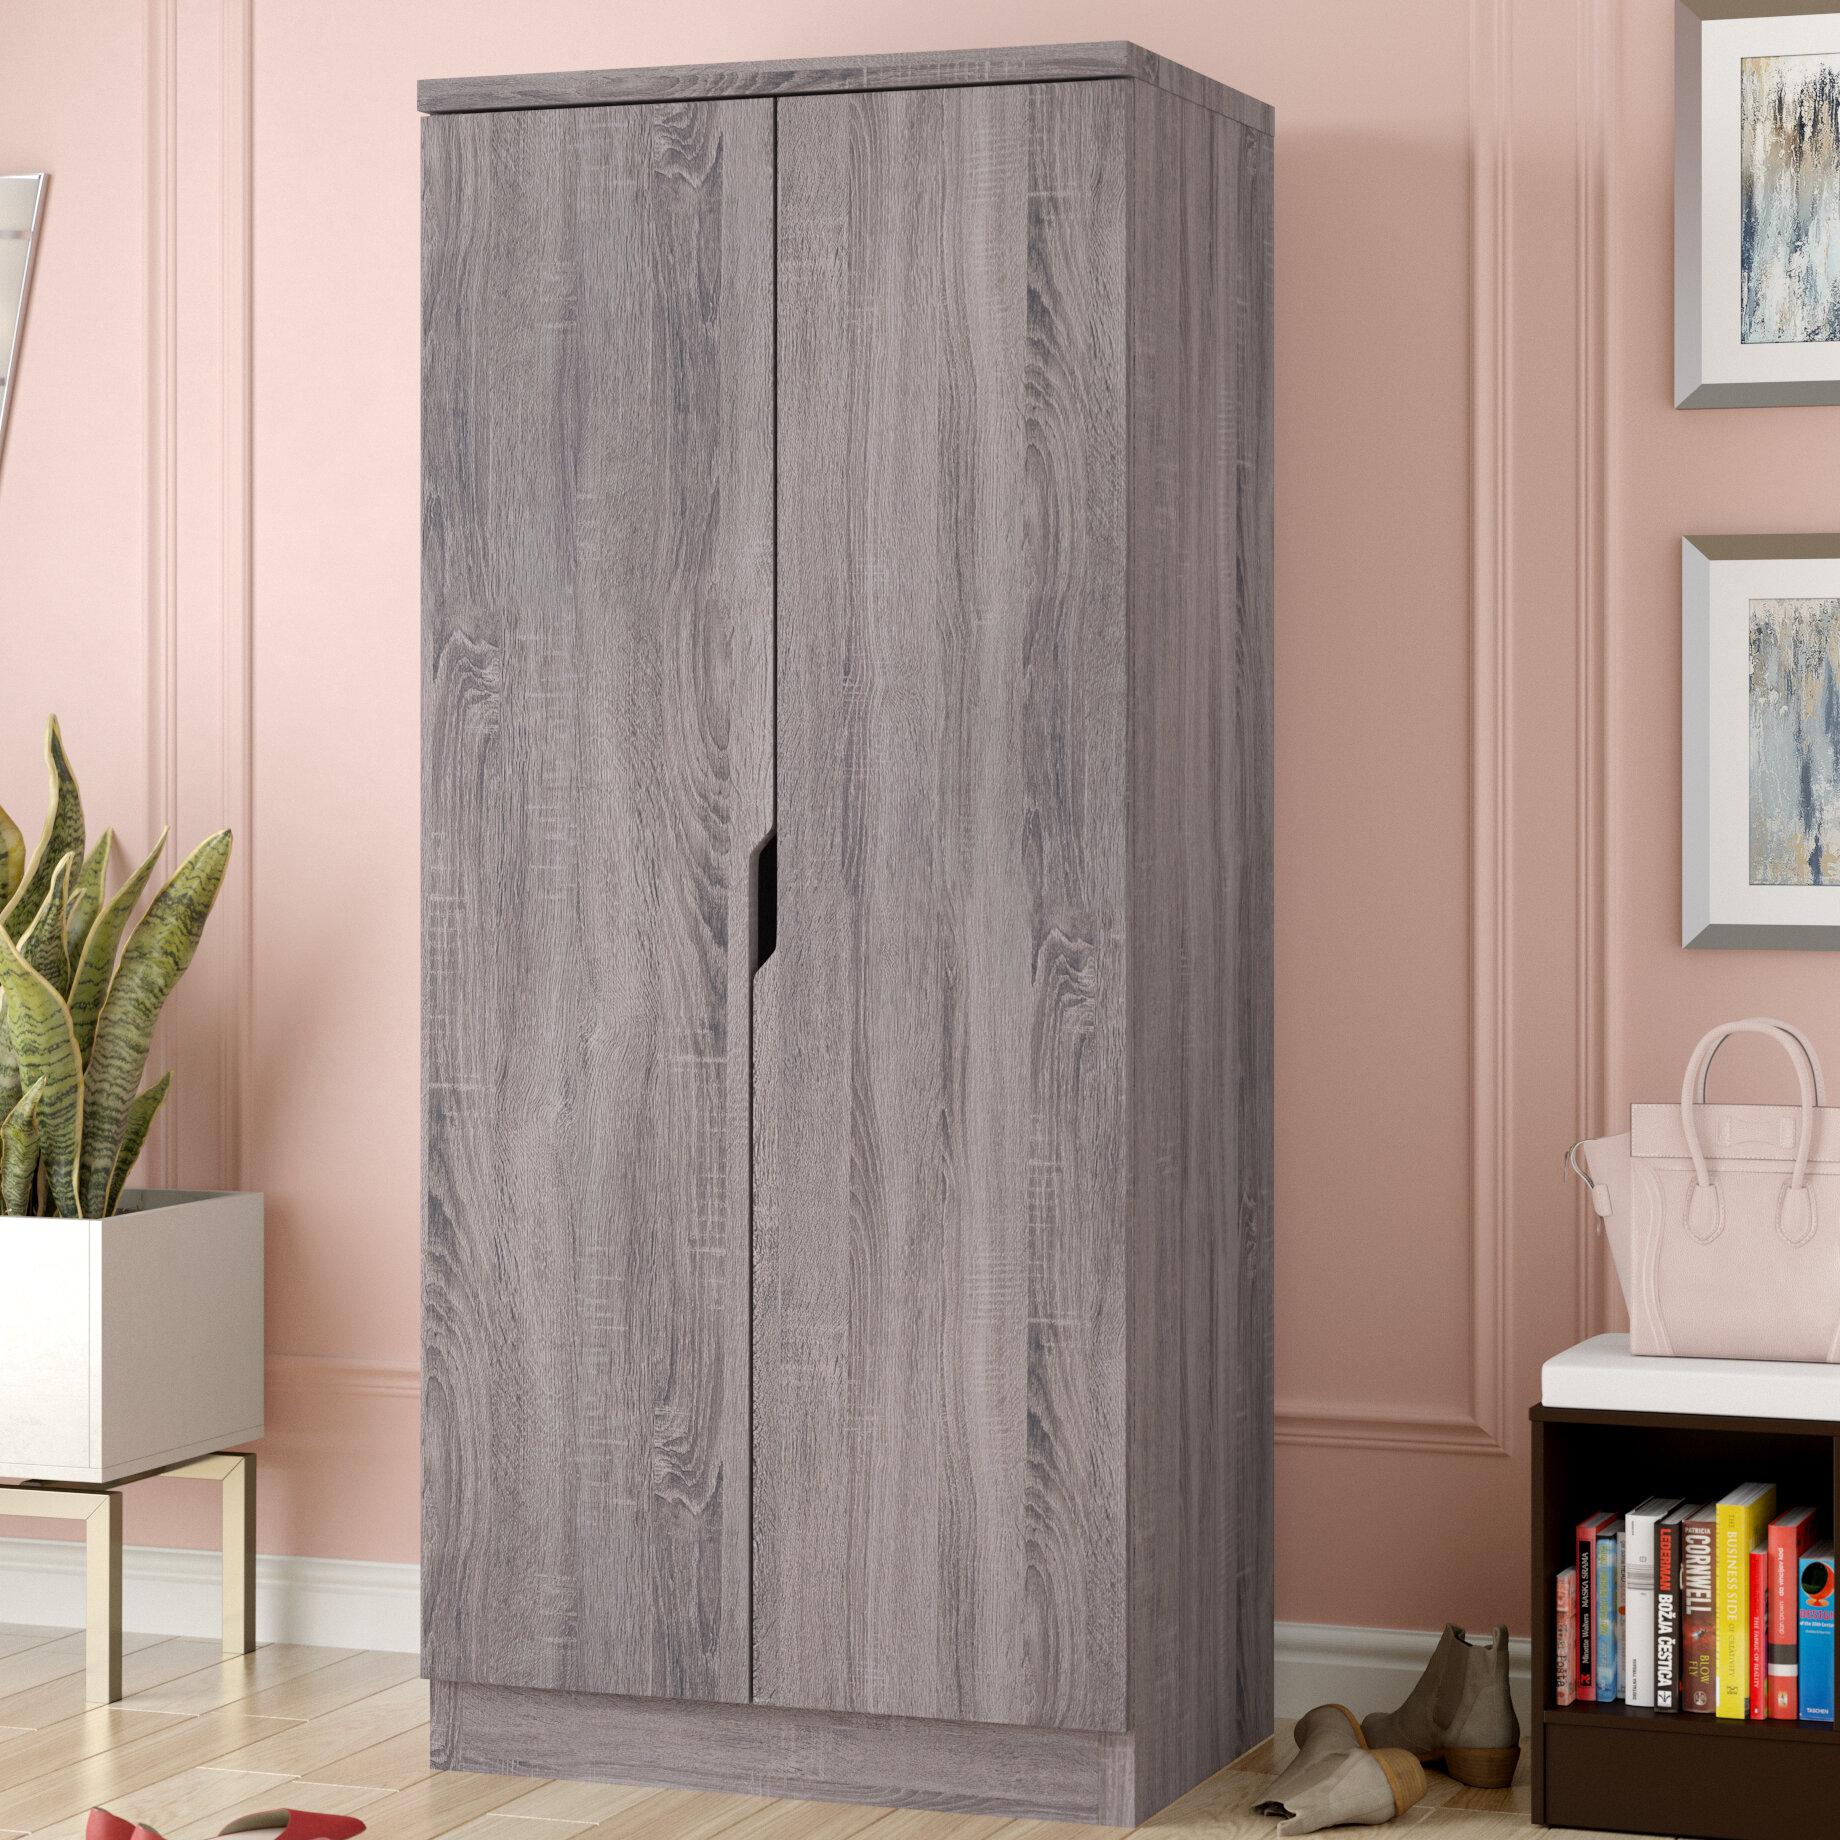 Ivy Bronx Cipriano Sophisticated 2 Magnet Closing Door Wardrobe